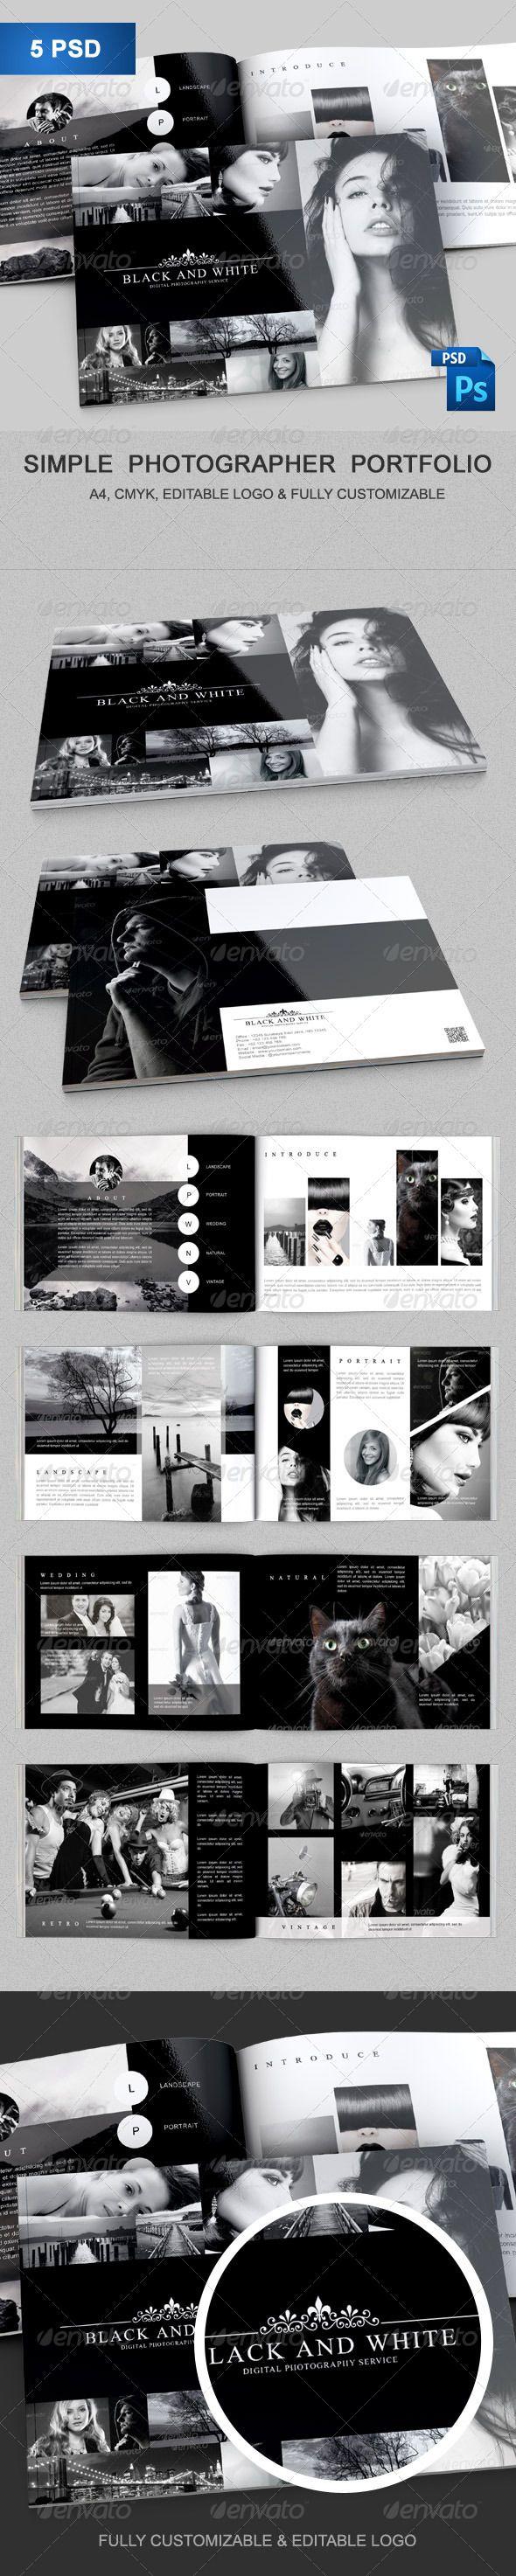 Simple Photographer Portfolio — Photoshop PSD #photoshop template #cv • Available here → https://graphicriver.net/item/simple-photographer-portfolio/8540416?ref=pxcr